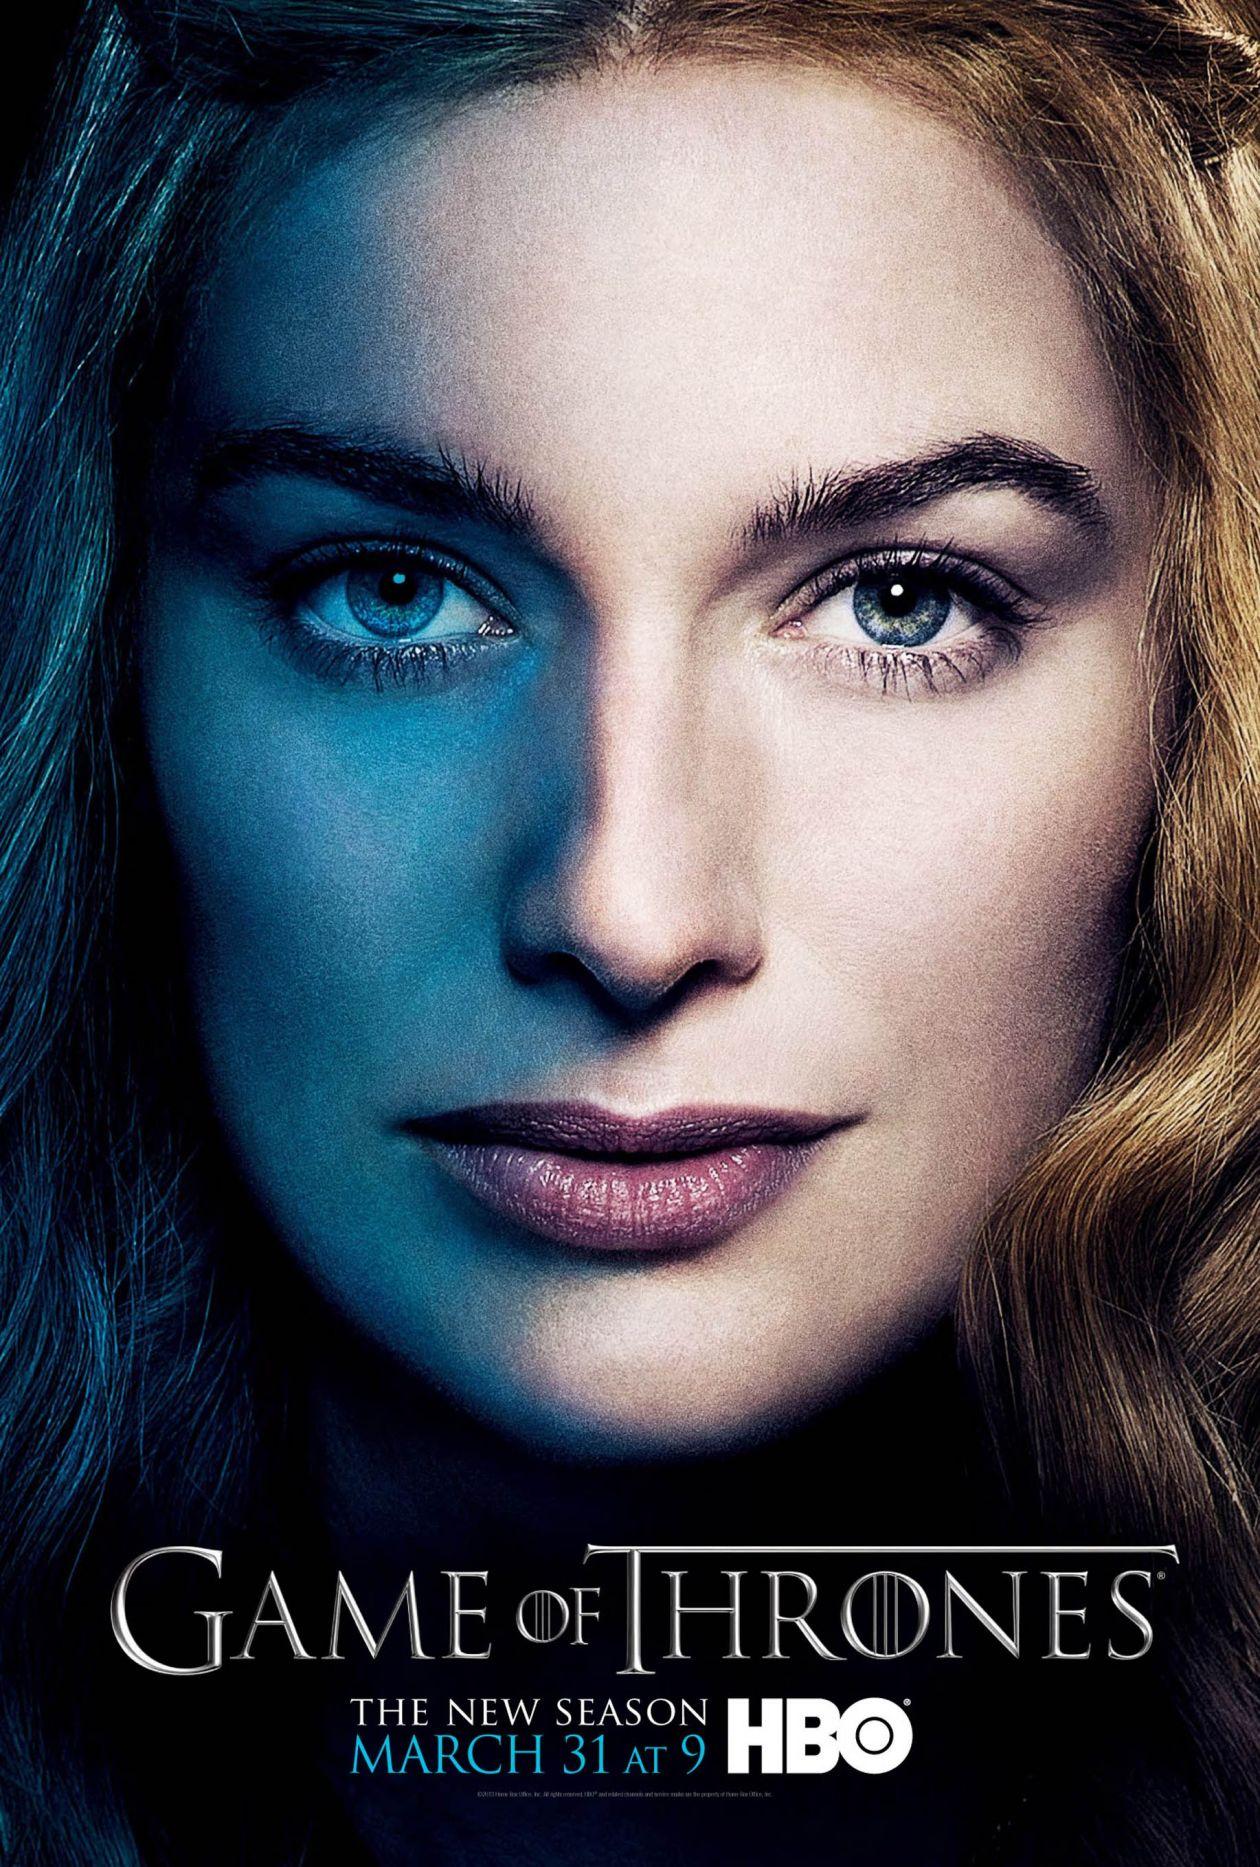 Lena Headey actress / Game of Thrones / Queen of the Seven Kingdoms / Cersei Lannister SEASON 3 2013